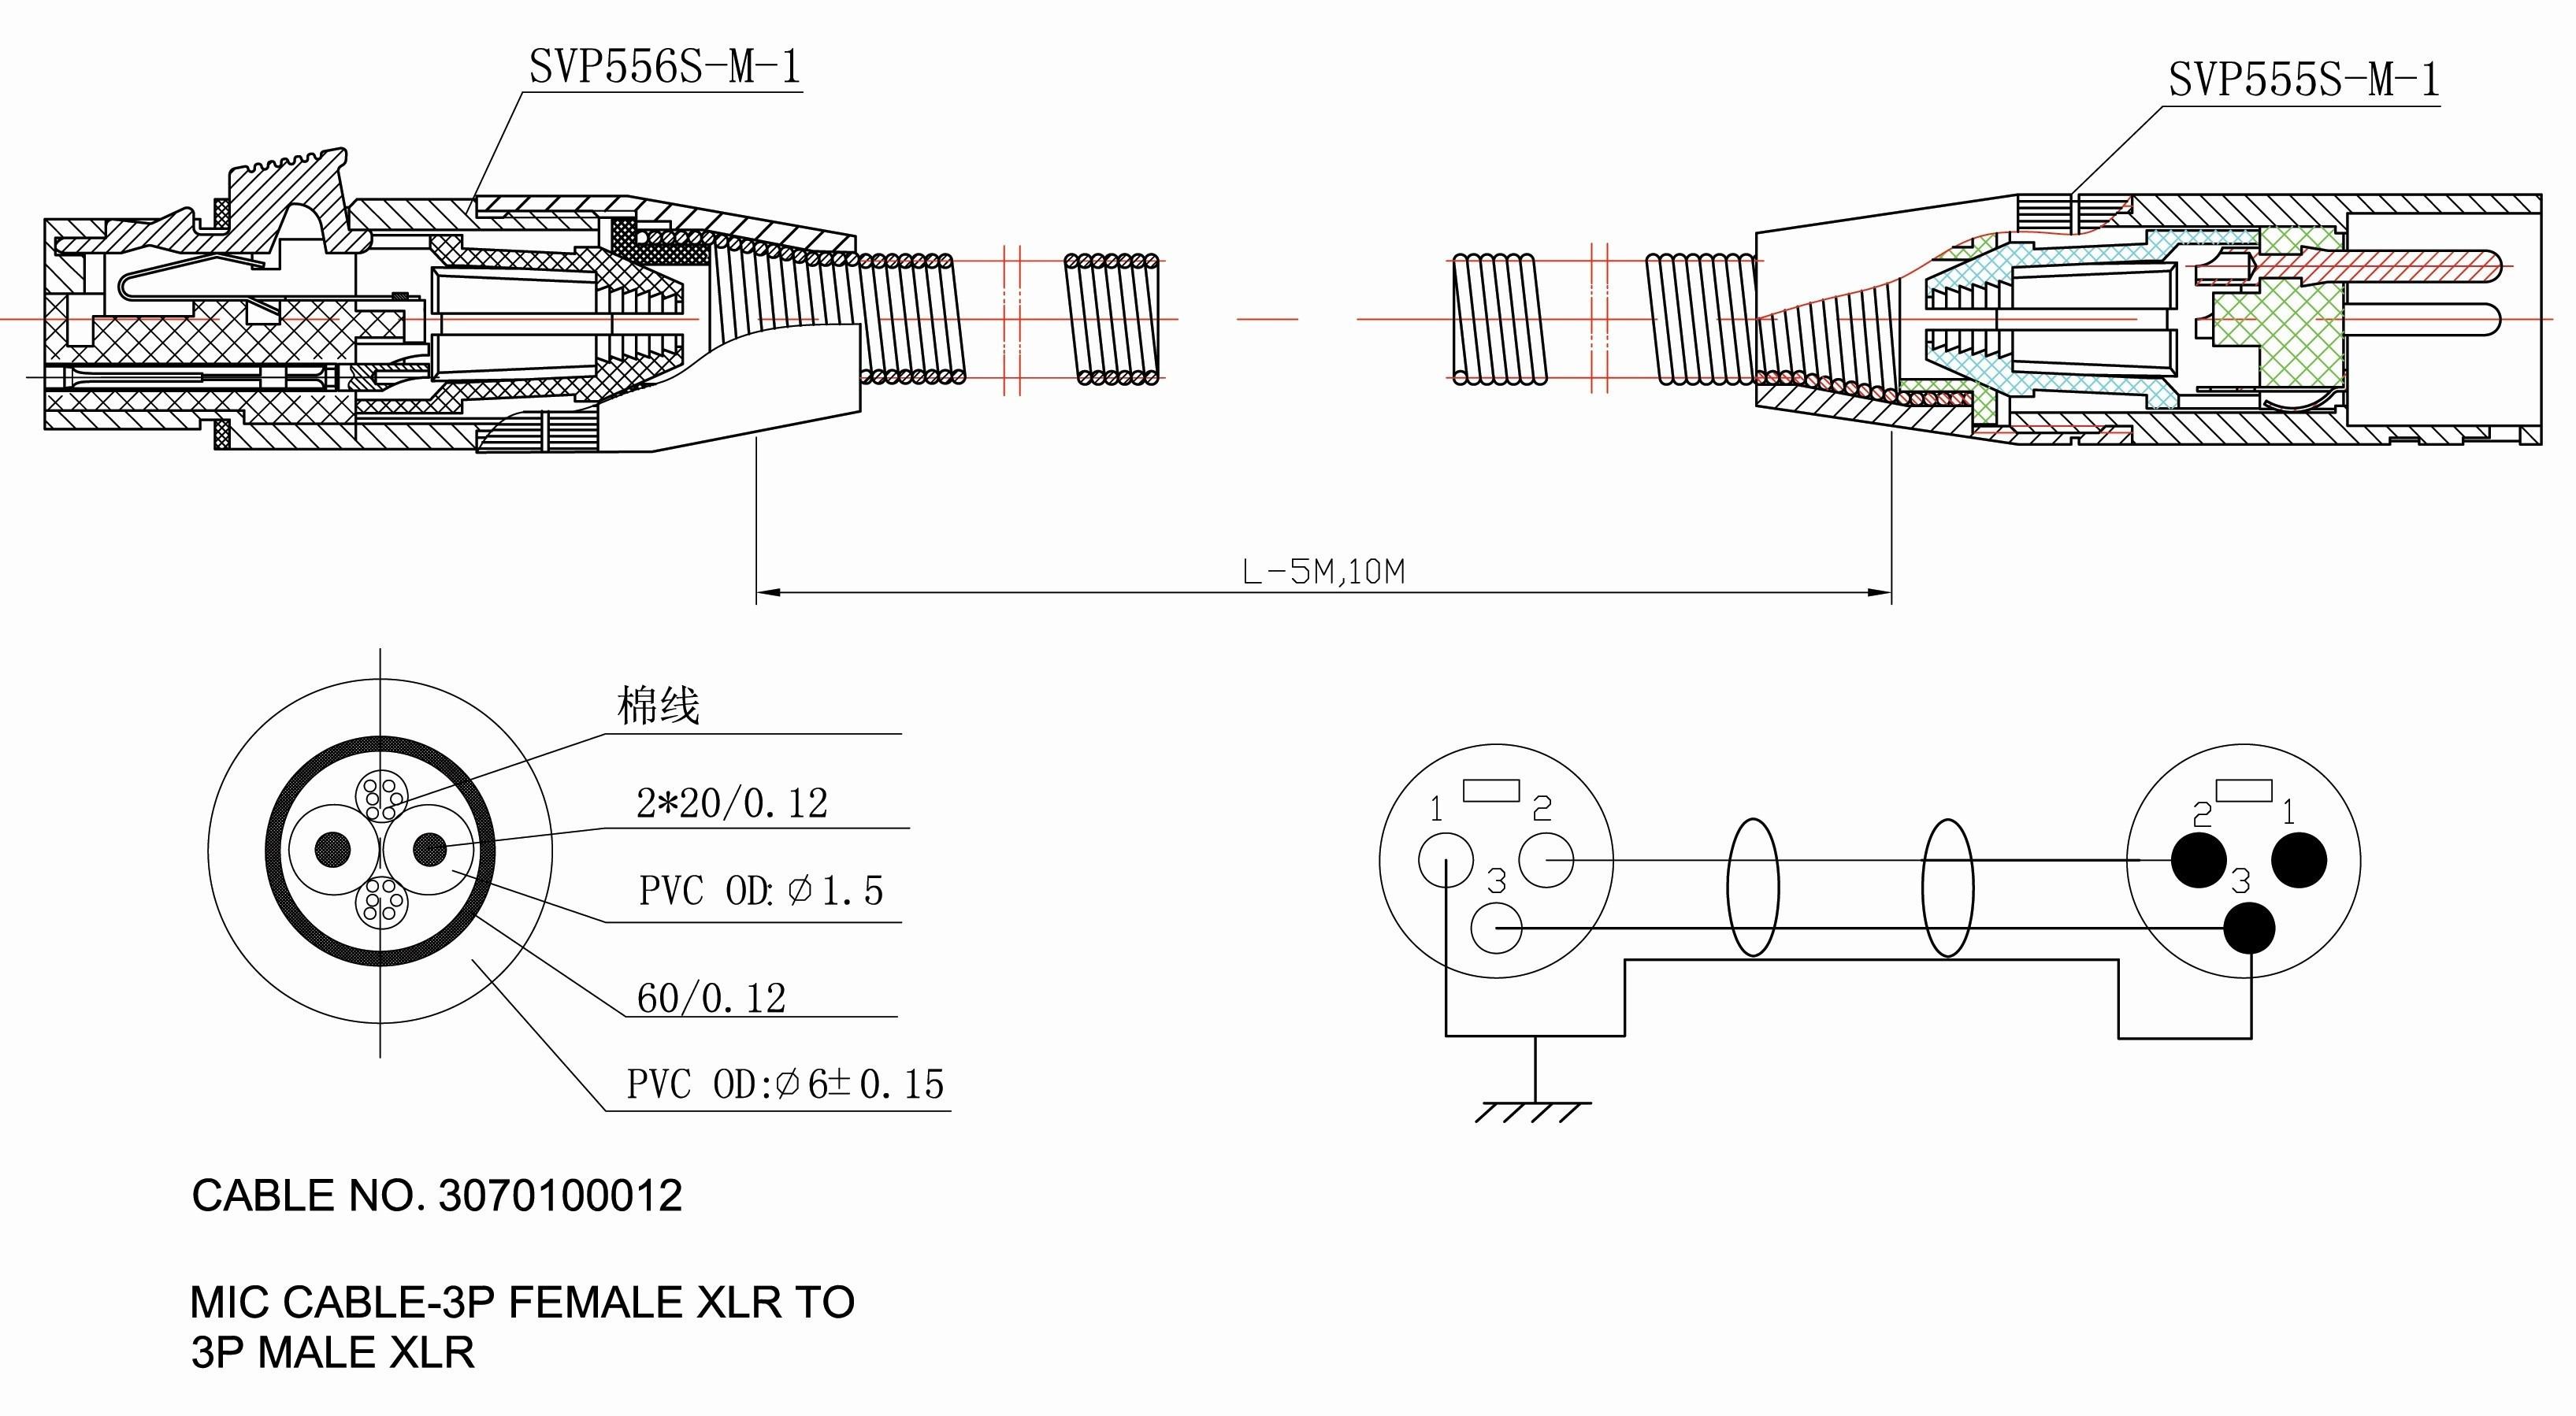 Simple Wiring Diagram Fresh Simple Electrical Circuit Diagram Fresh